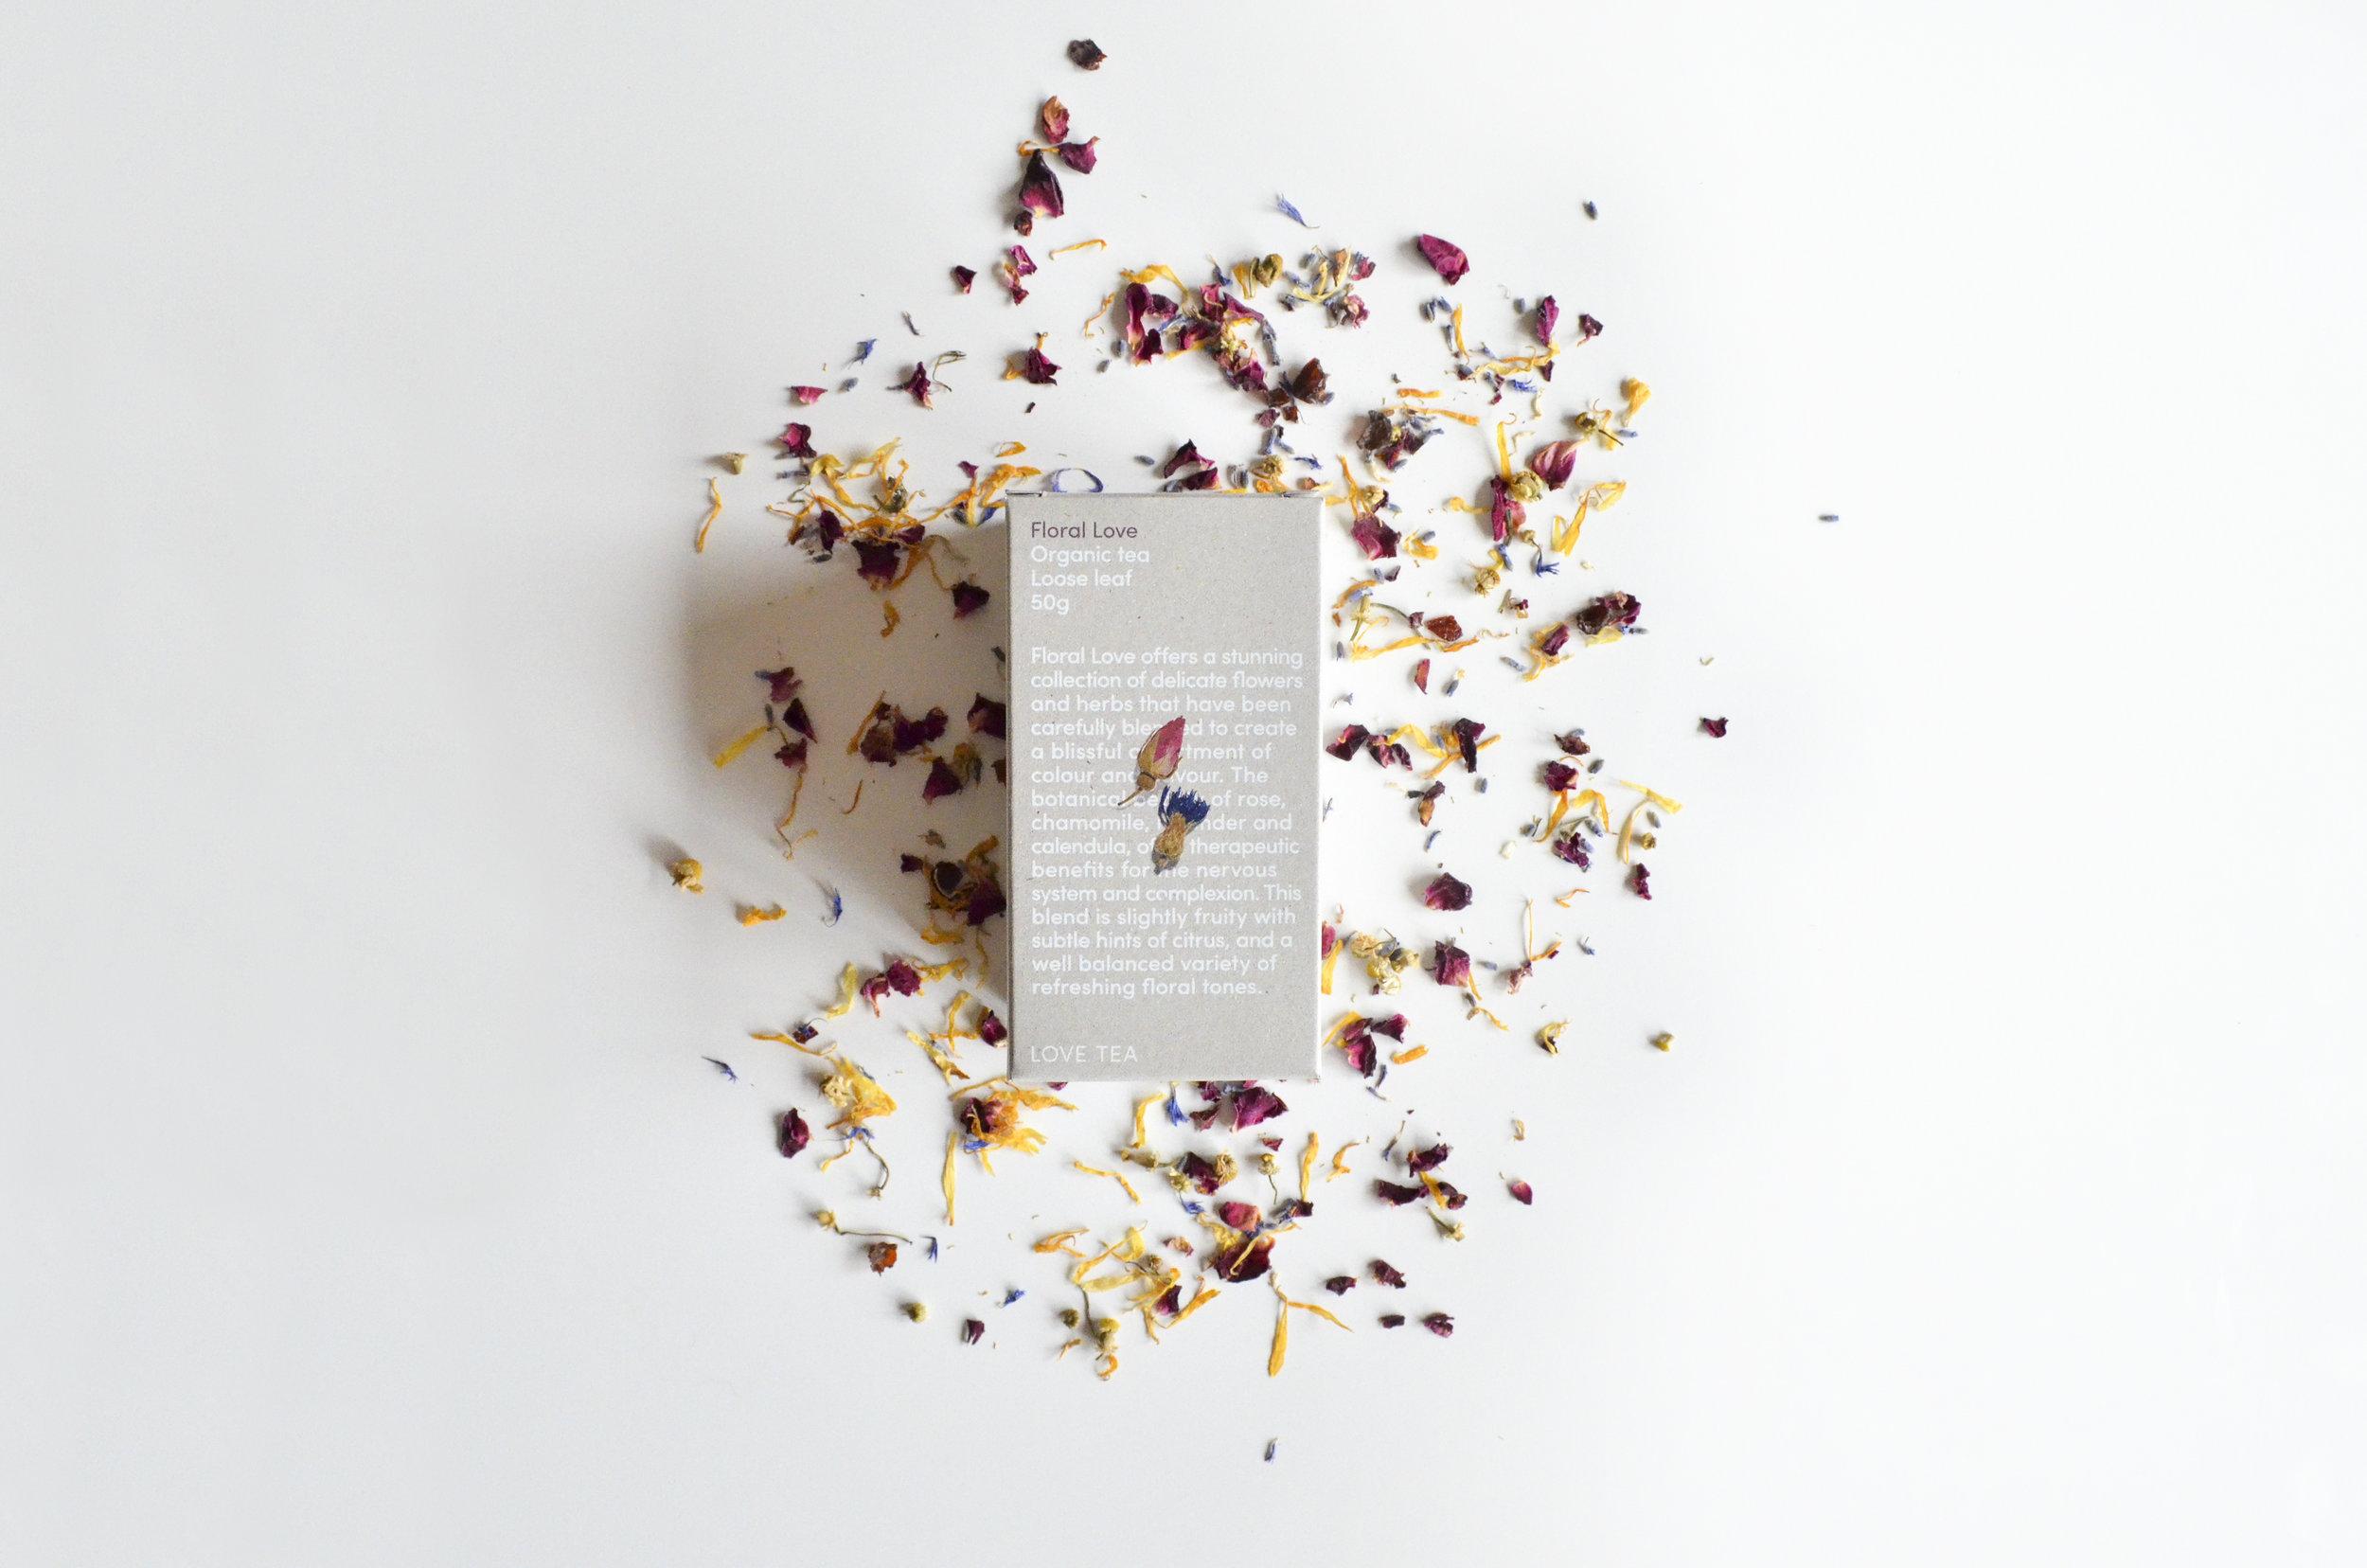 florallove-03.jpg